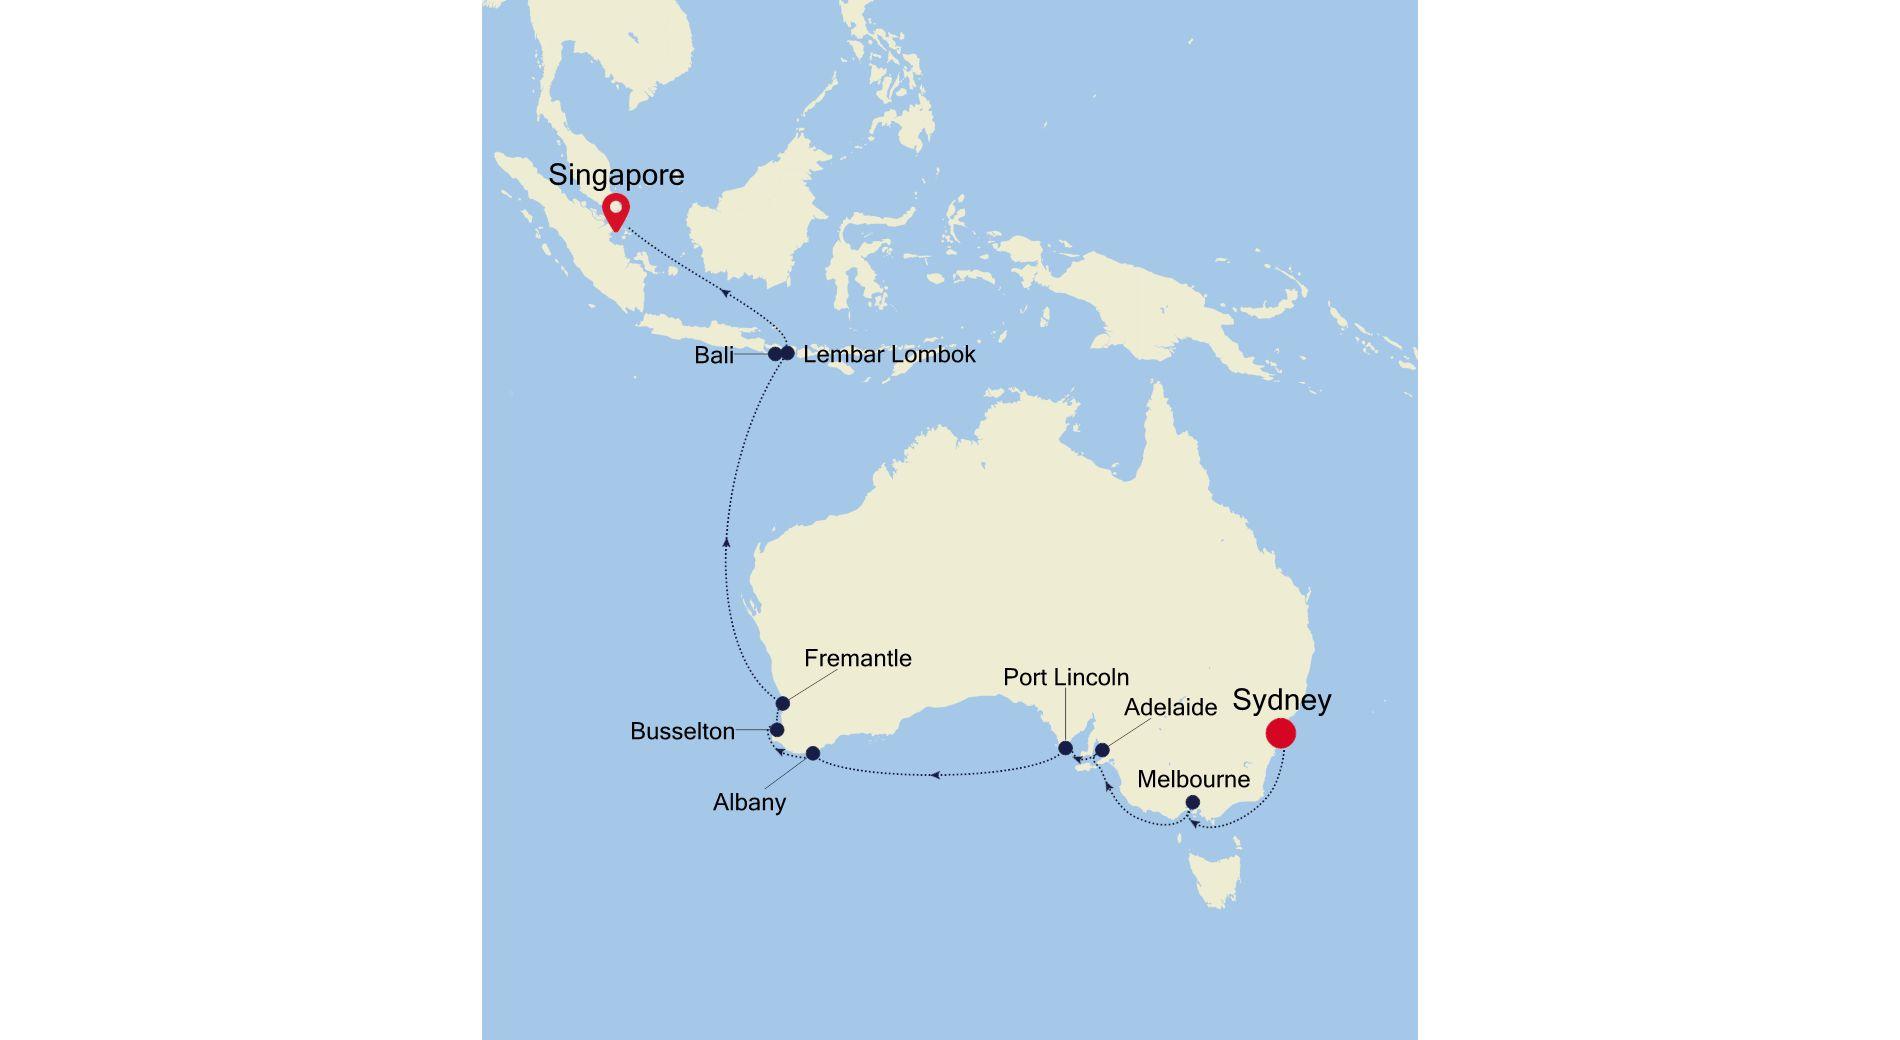 SM220219018 - Sydney à Singapore